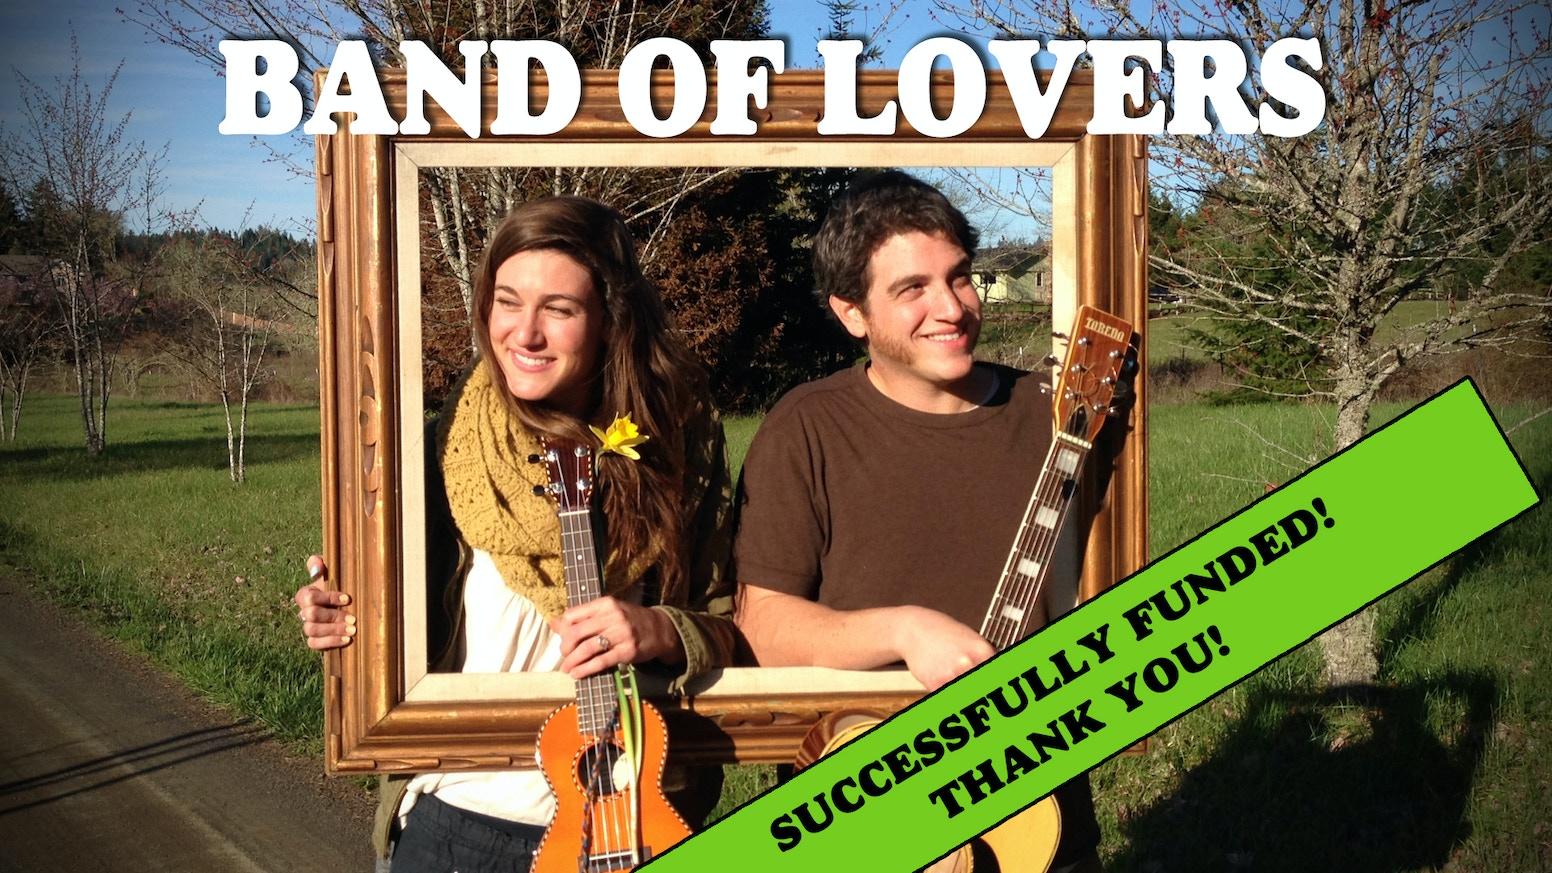 Band of Lovers - Debut Album! by Sabina —Kickstarter